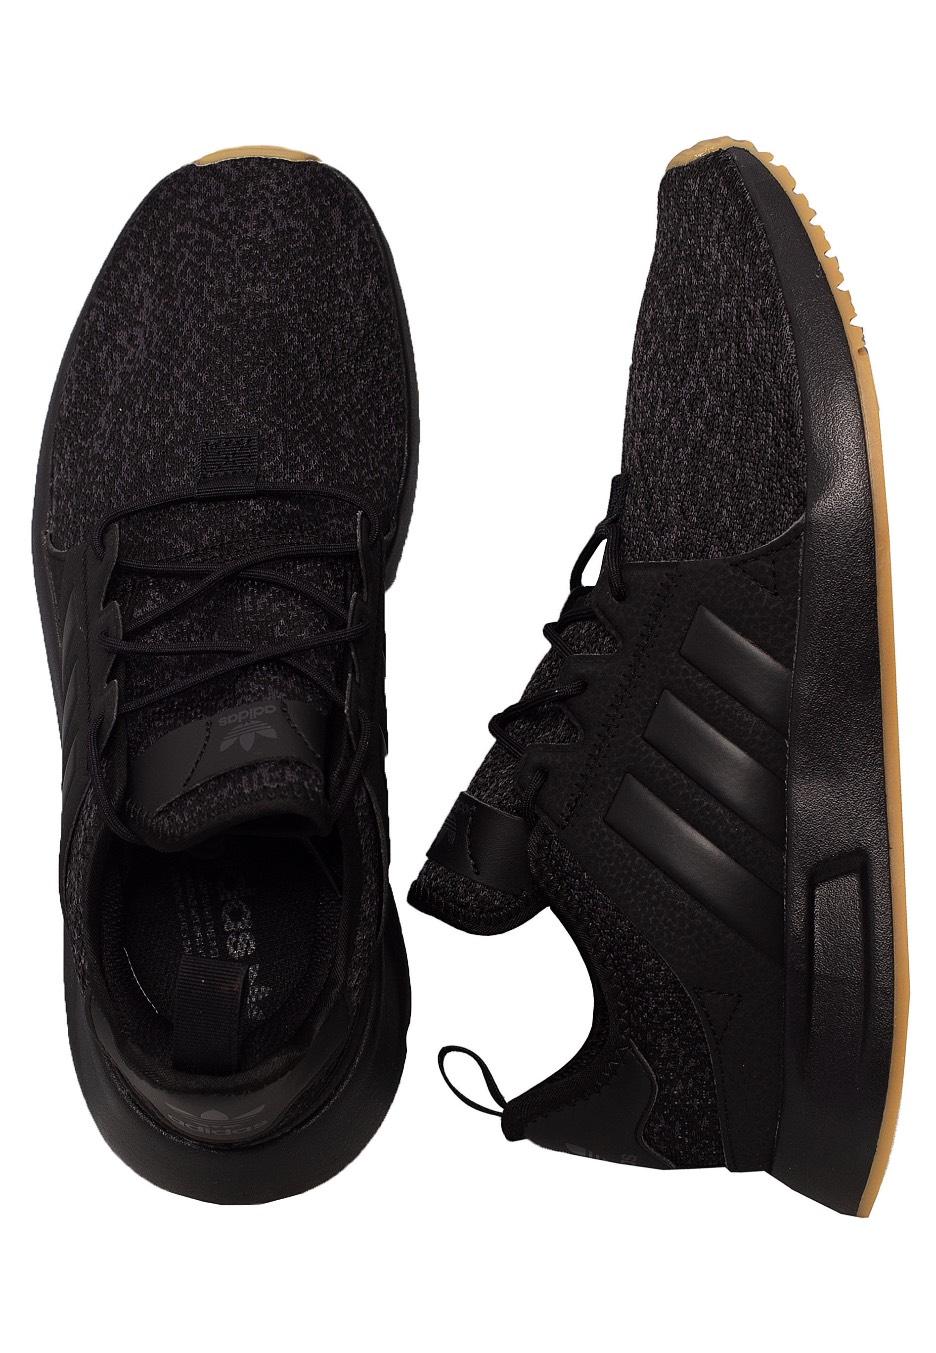 4 X plr Blackcore Core Impericon Adidas Chaussures Blackgum wOXdqqF